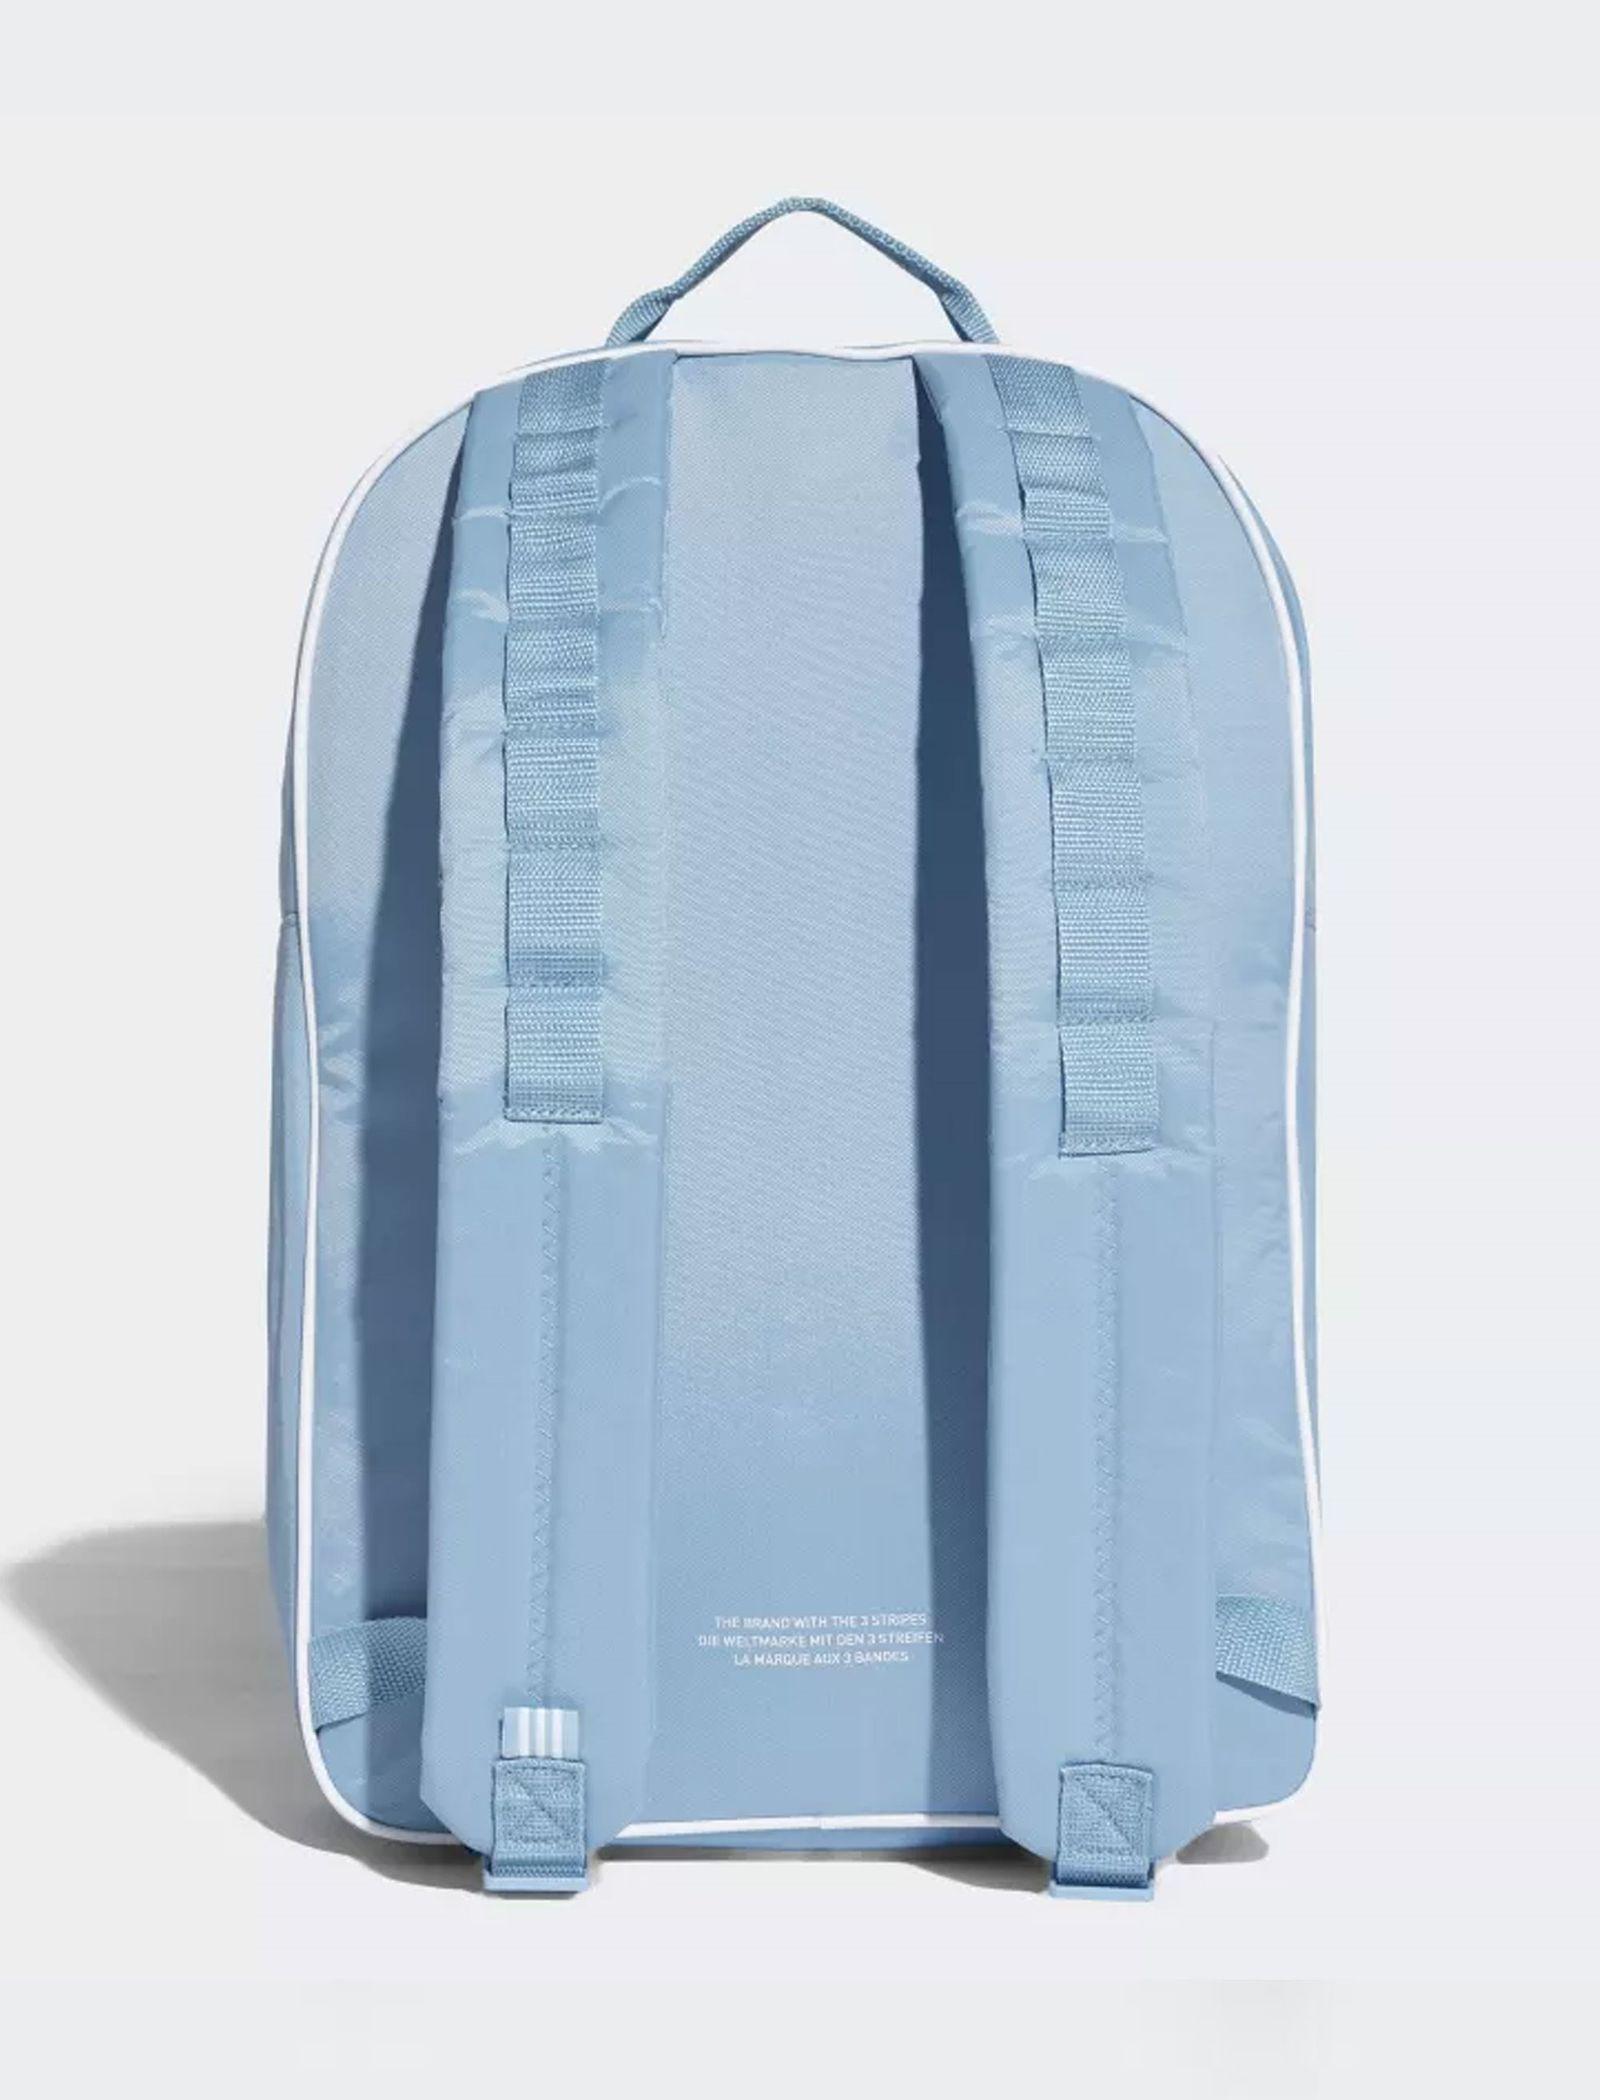 کوله پشتی روزمره بزرگسال Classic - آدیداس تک سایز - آبي روشن - 2